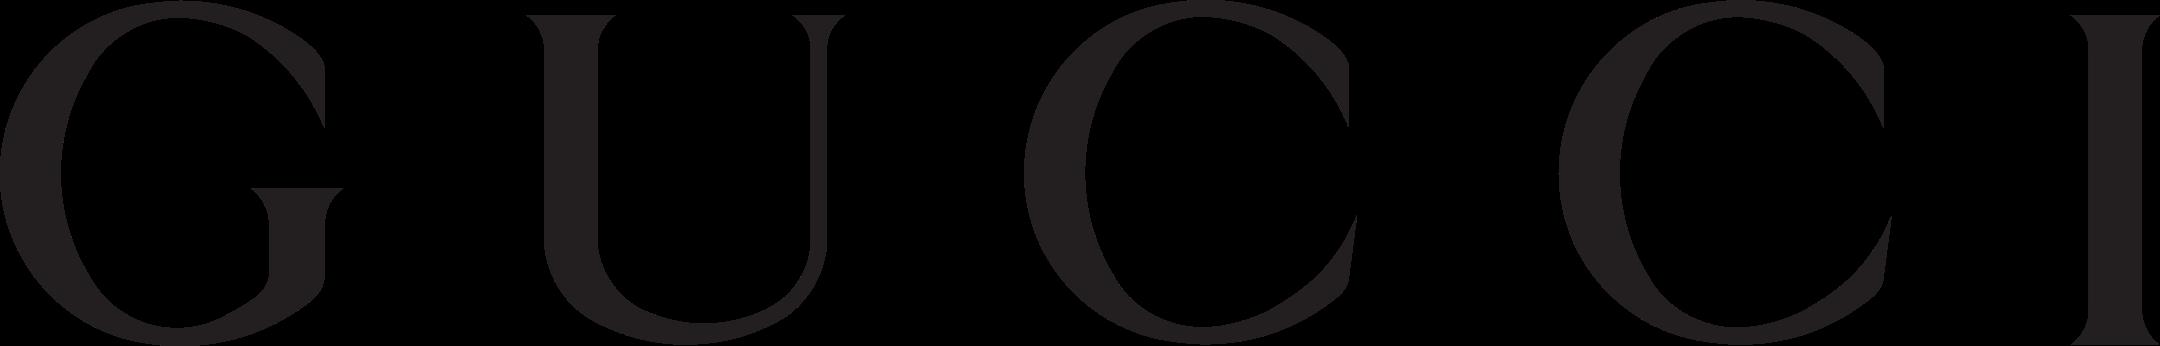 gucci logo 3 - Gucci Logo